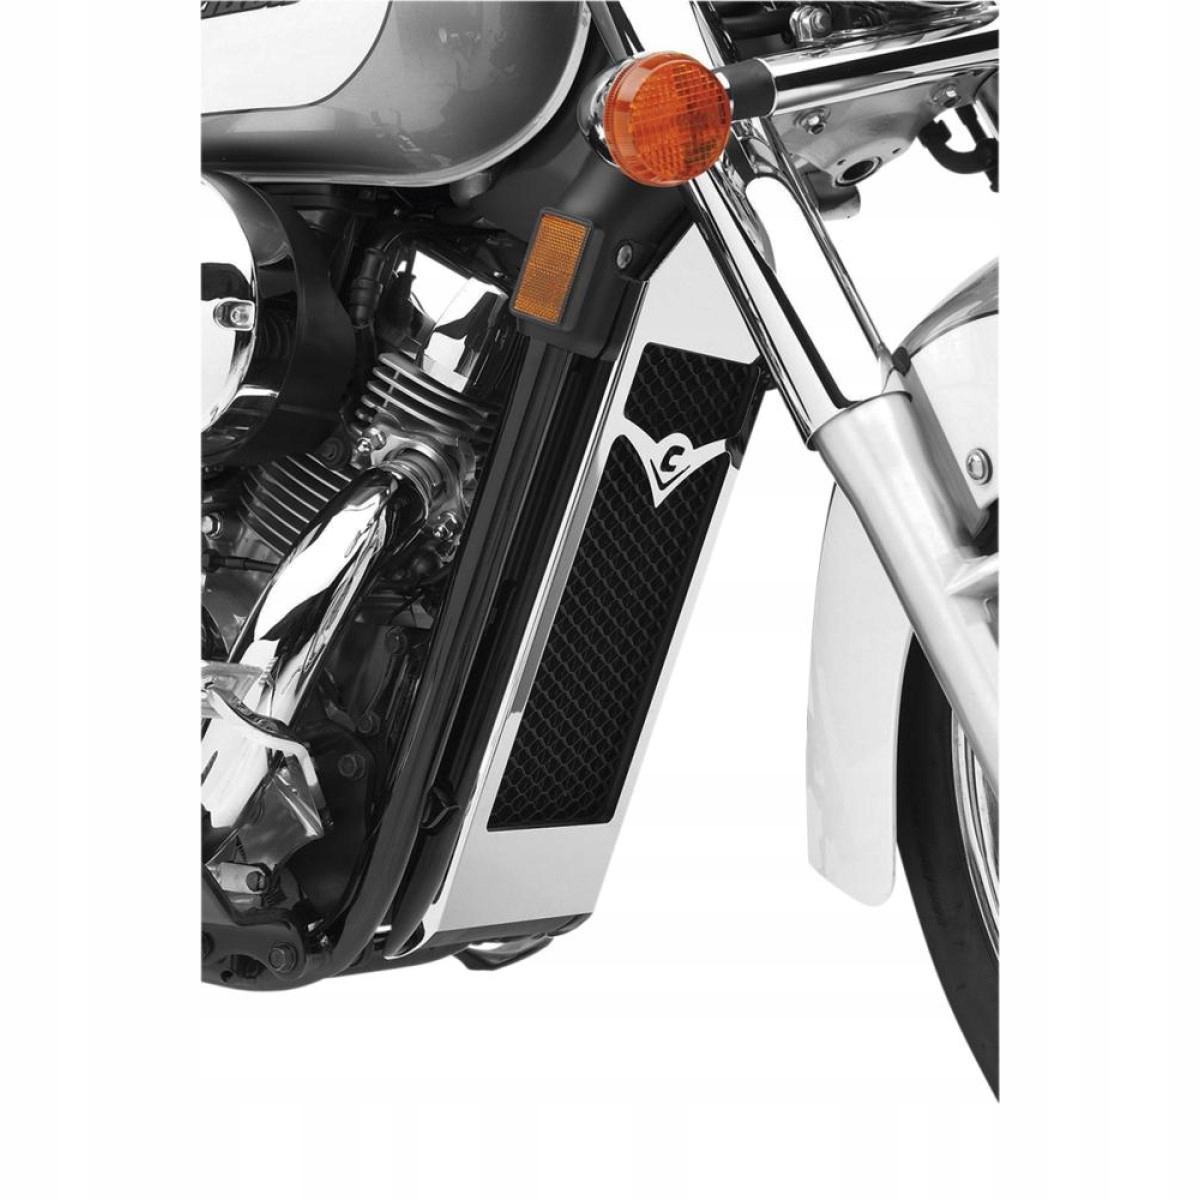 Osłona chłodnicy Honda SHADOW/AERO 04-15